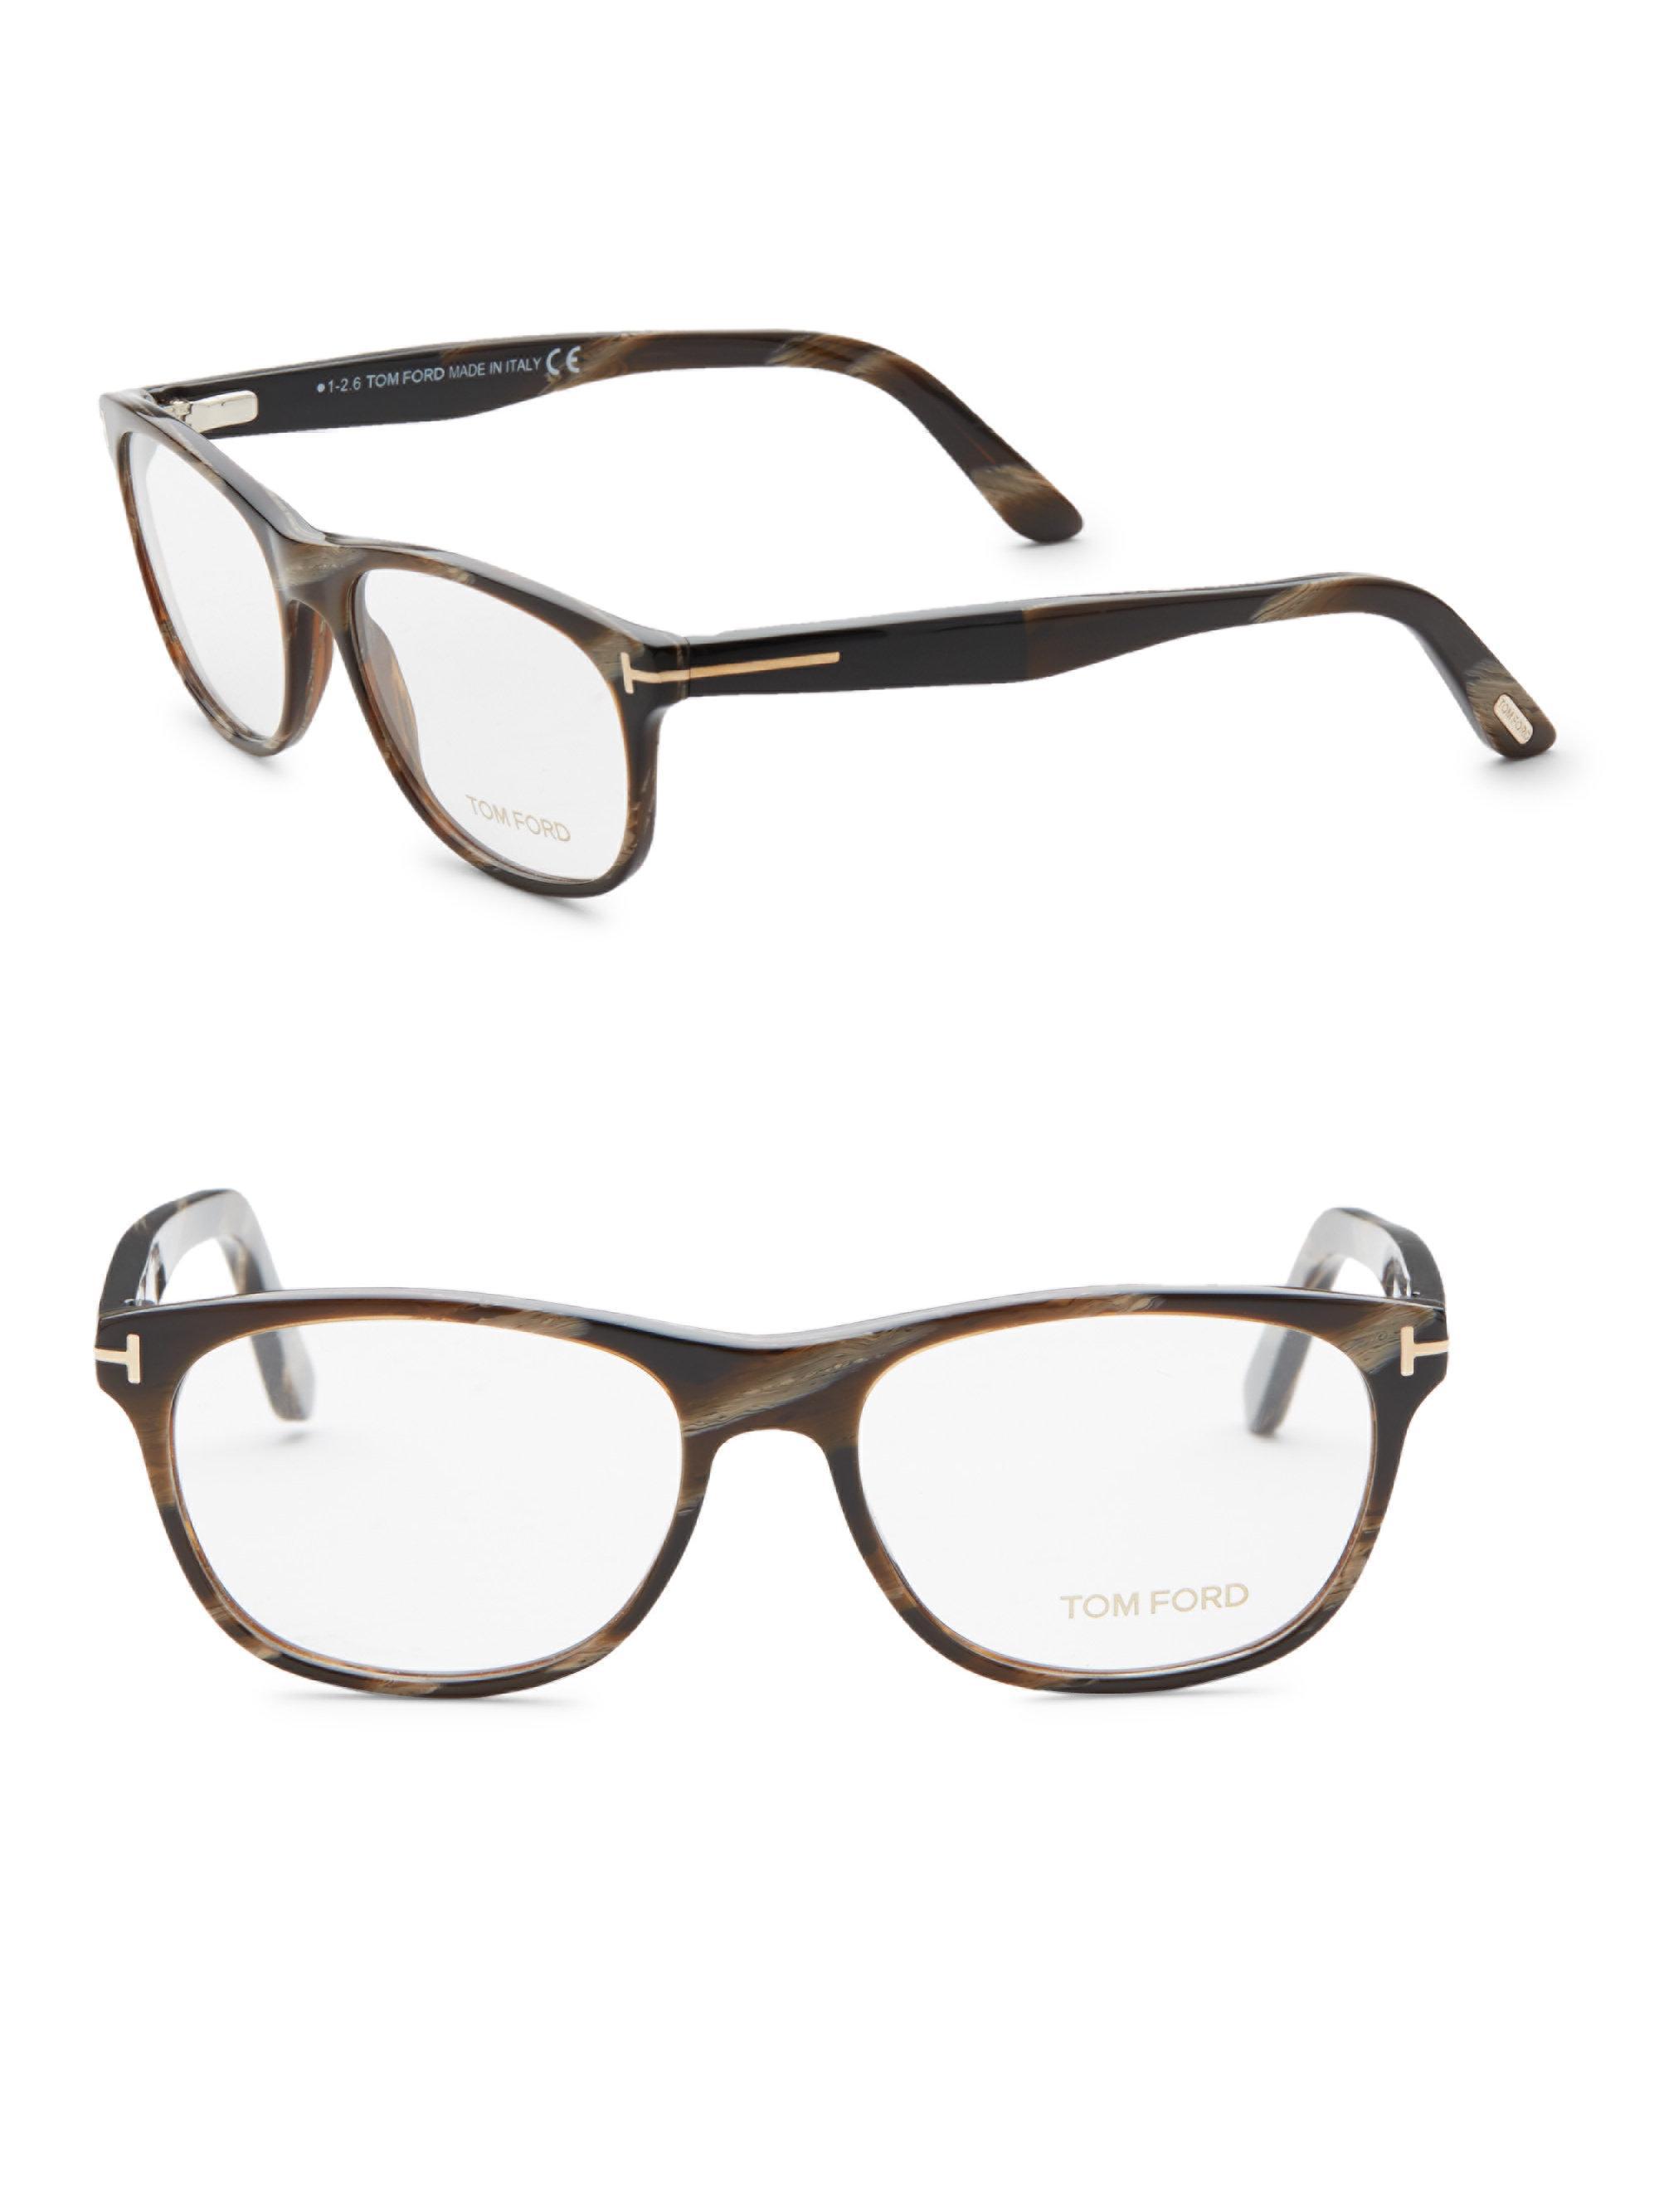 d70f8aef13 Tom Ford River Clubmaster Sunglasses In Matte Black   Tort Lens G ...